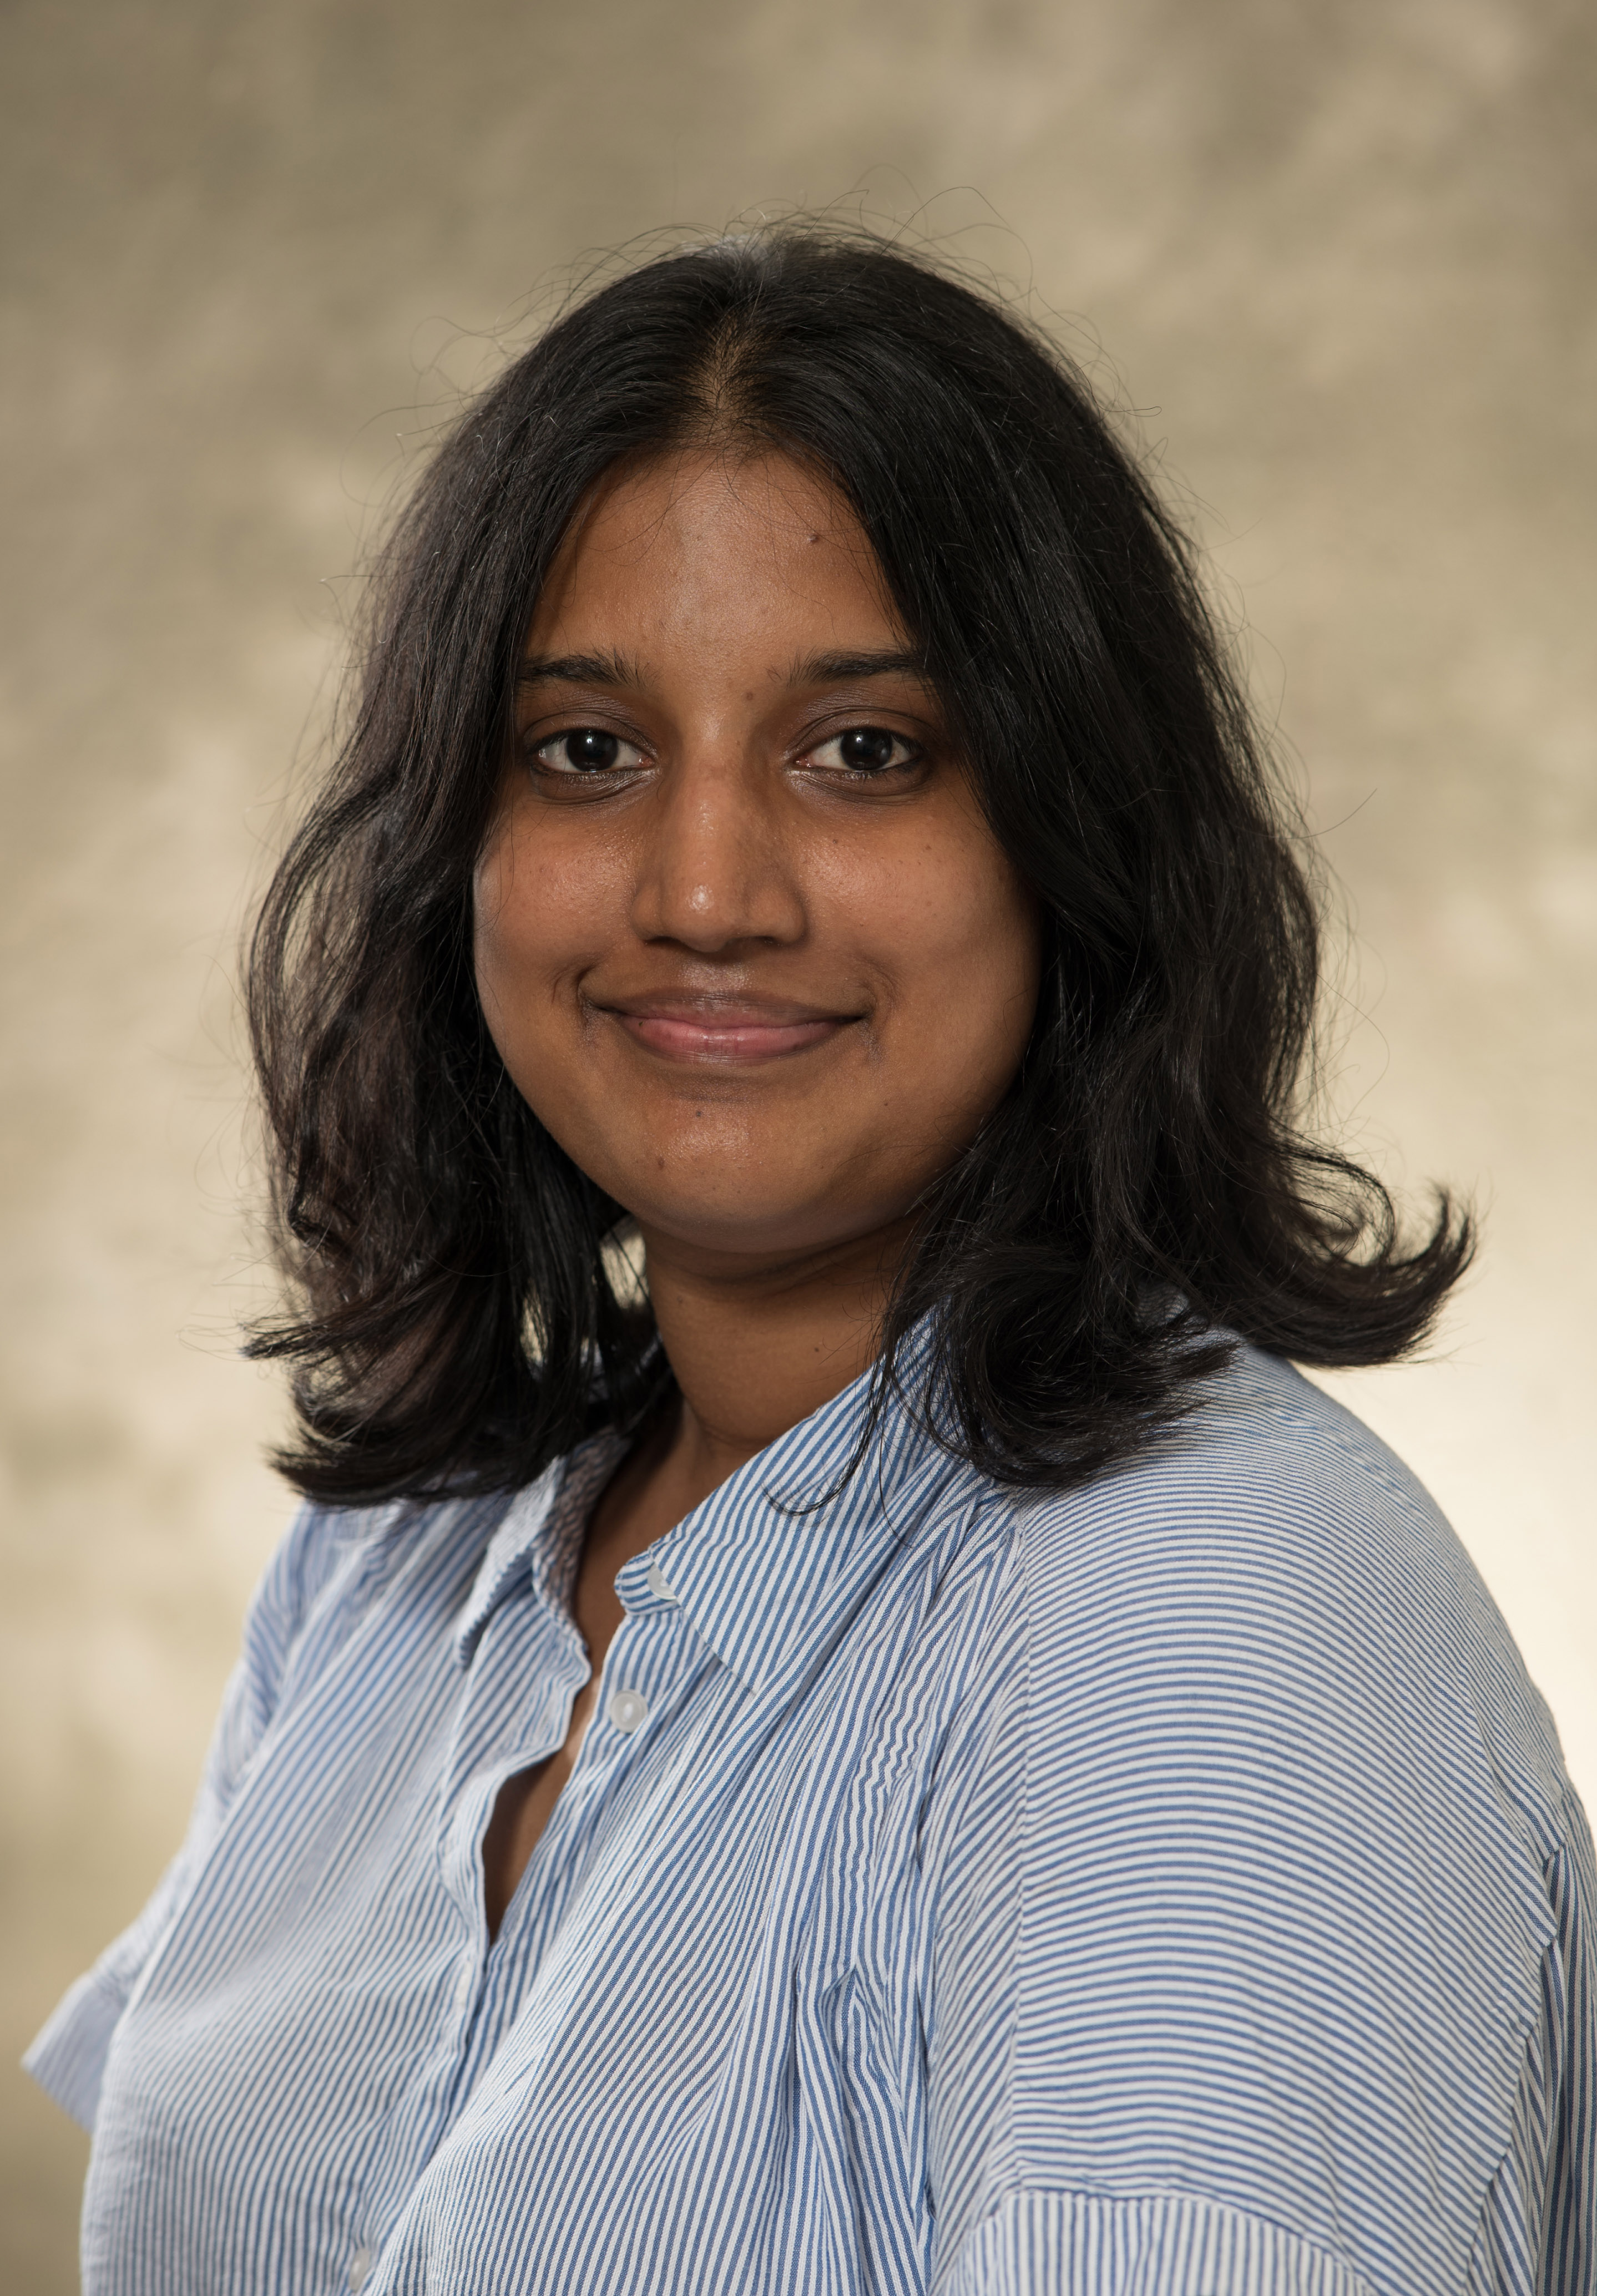 Sanjana Venkataraman's directory photo.